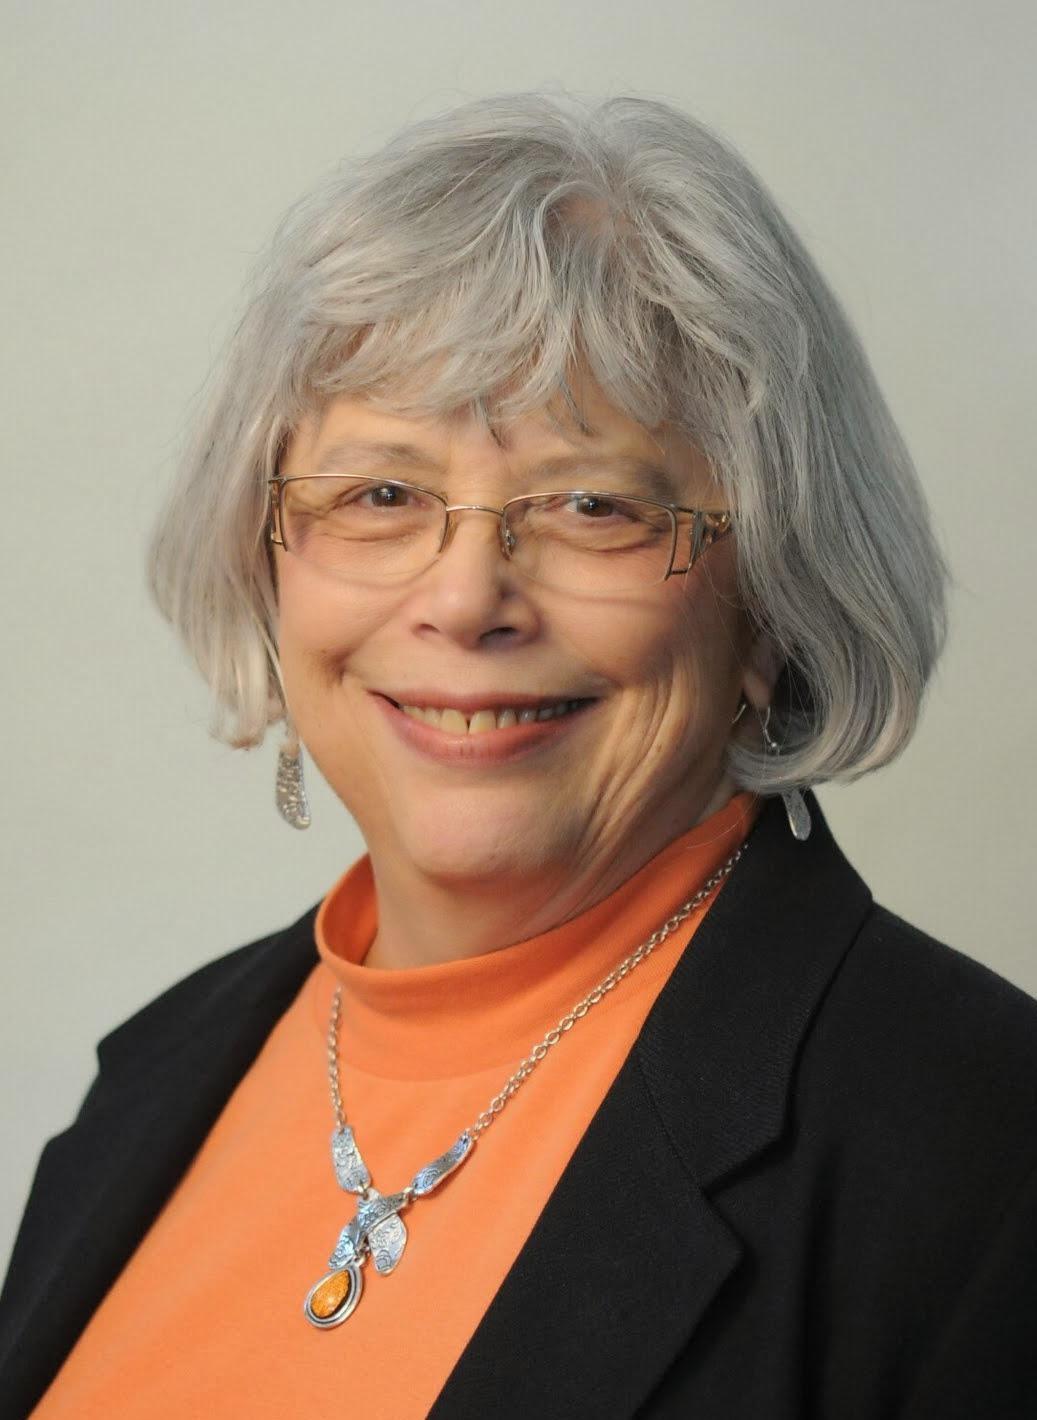 Sandy Buhrman